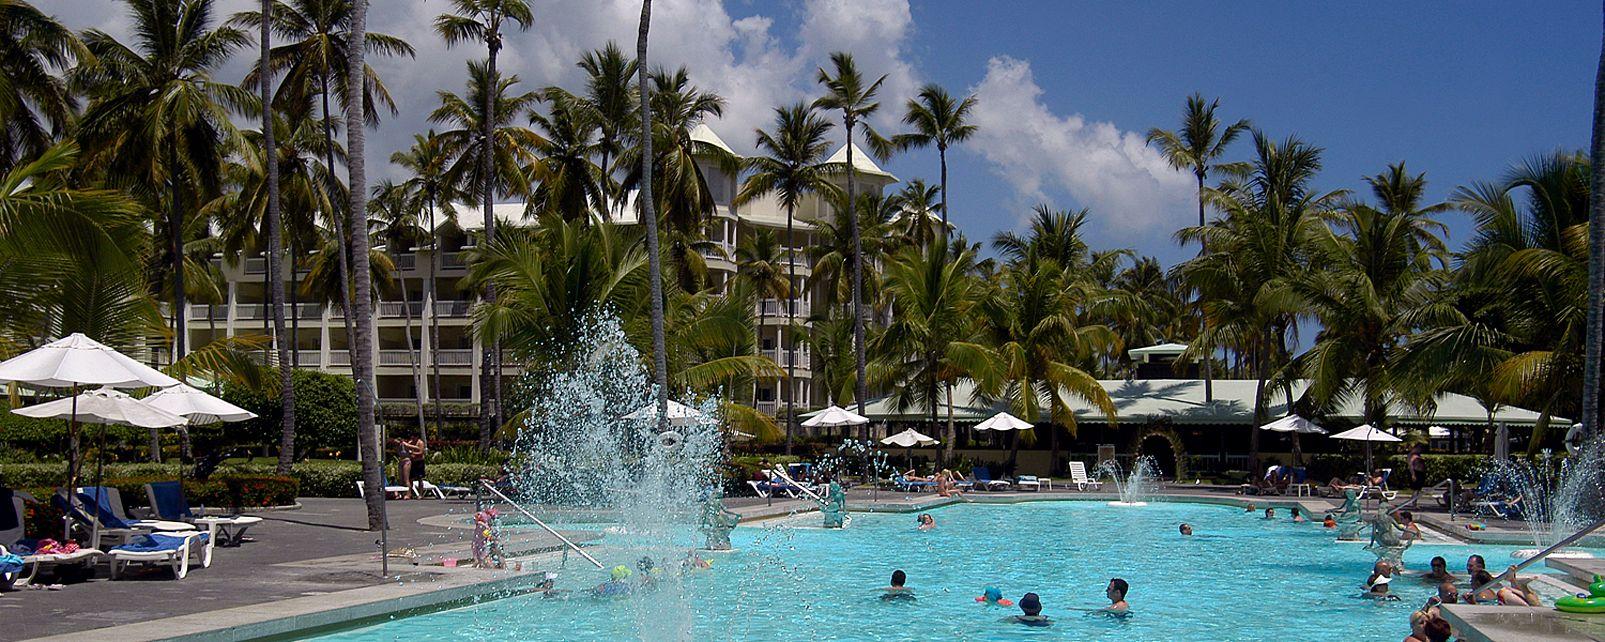 Hotel Riu Palace Macao Punta Cana Republique Dominicaine